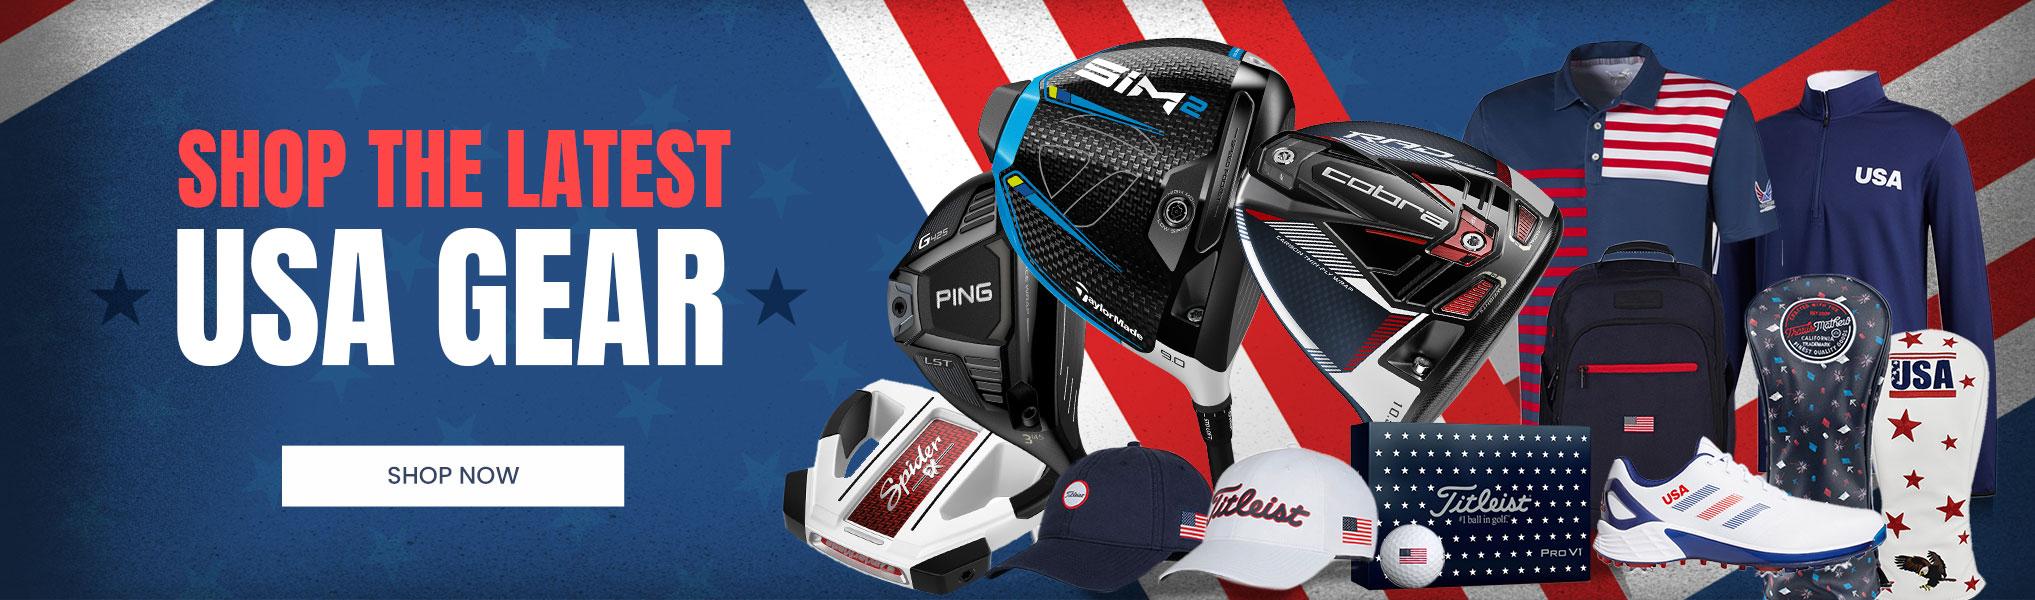 Shop the latest USA Gear